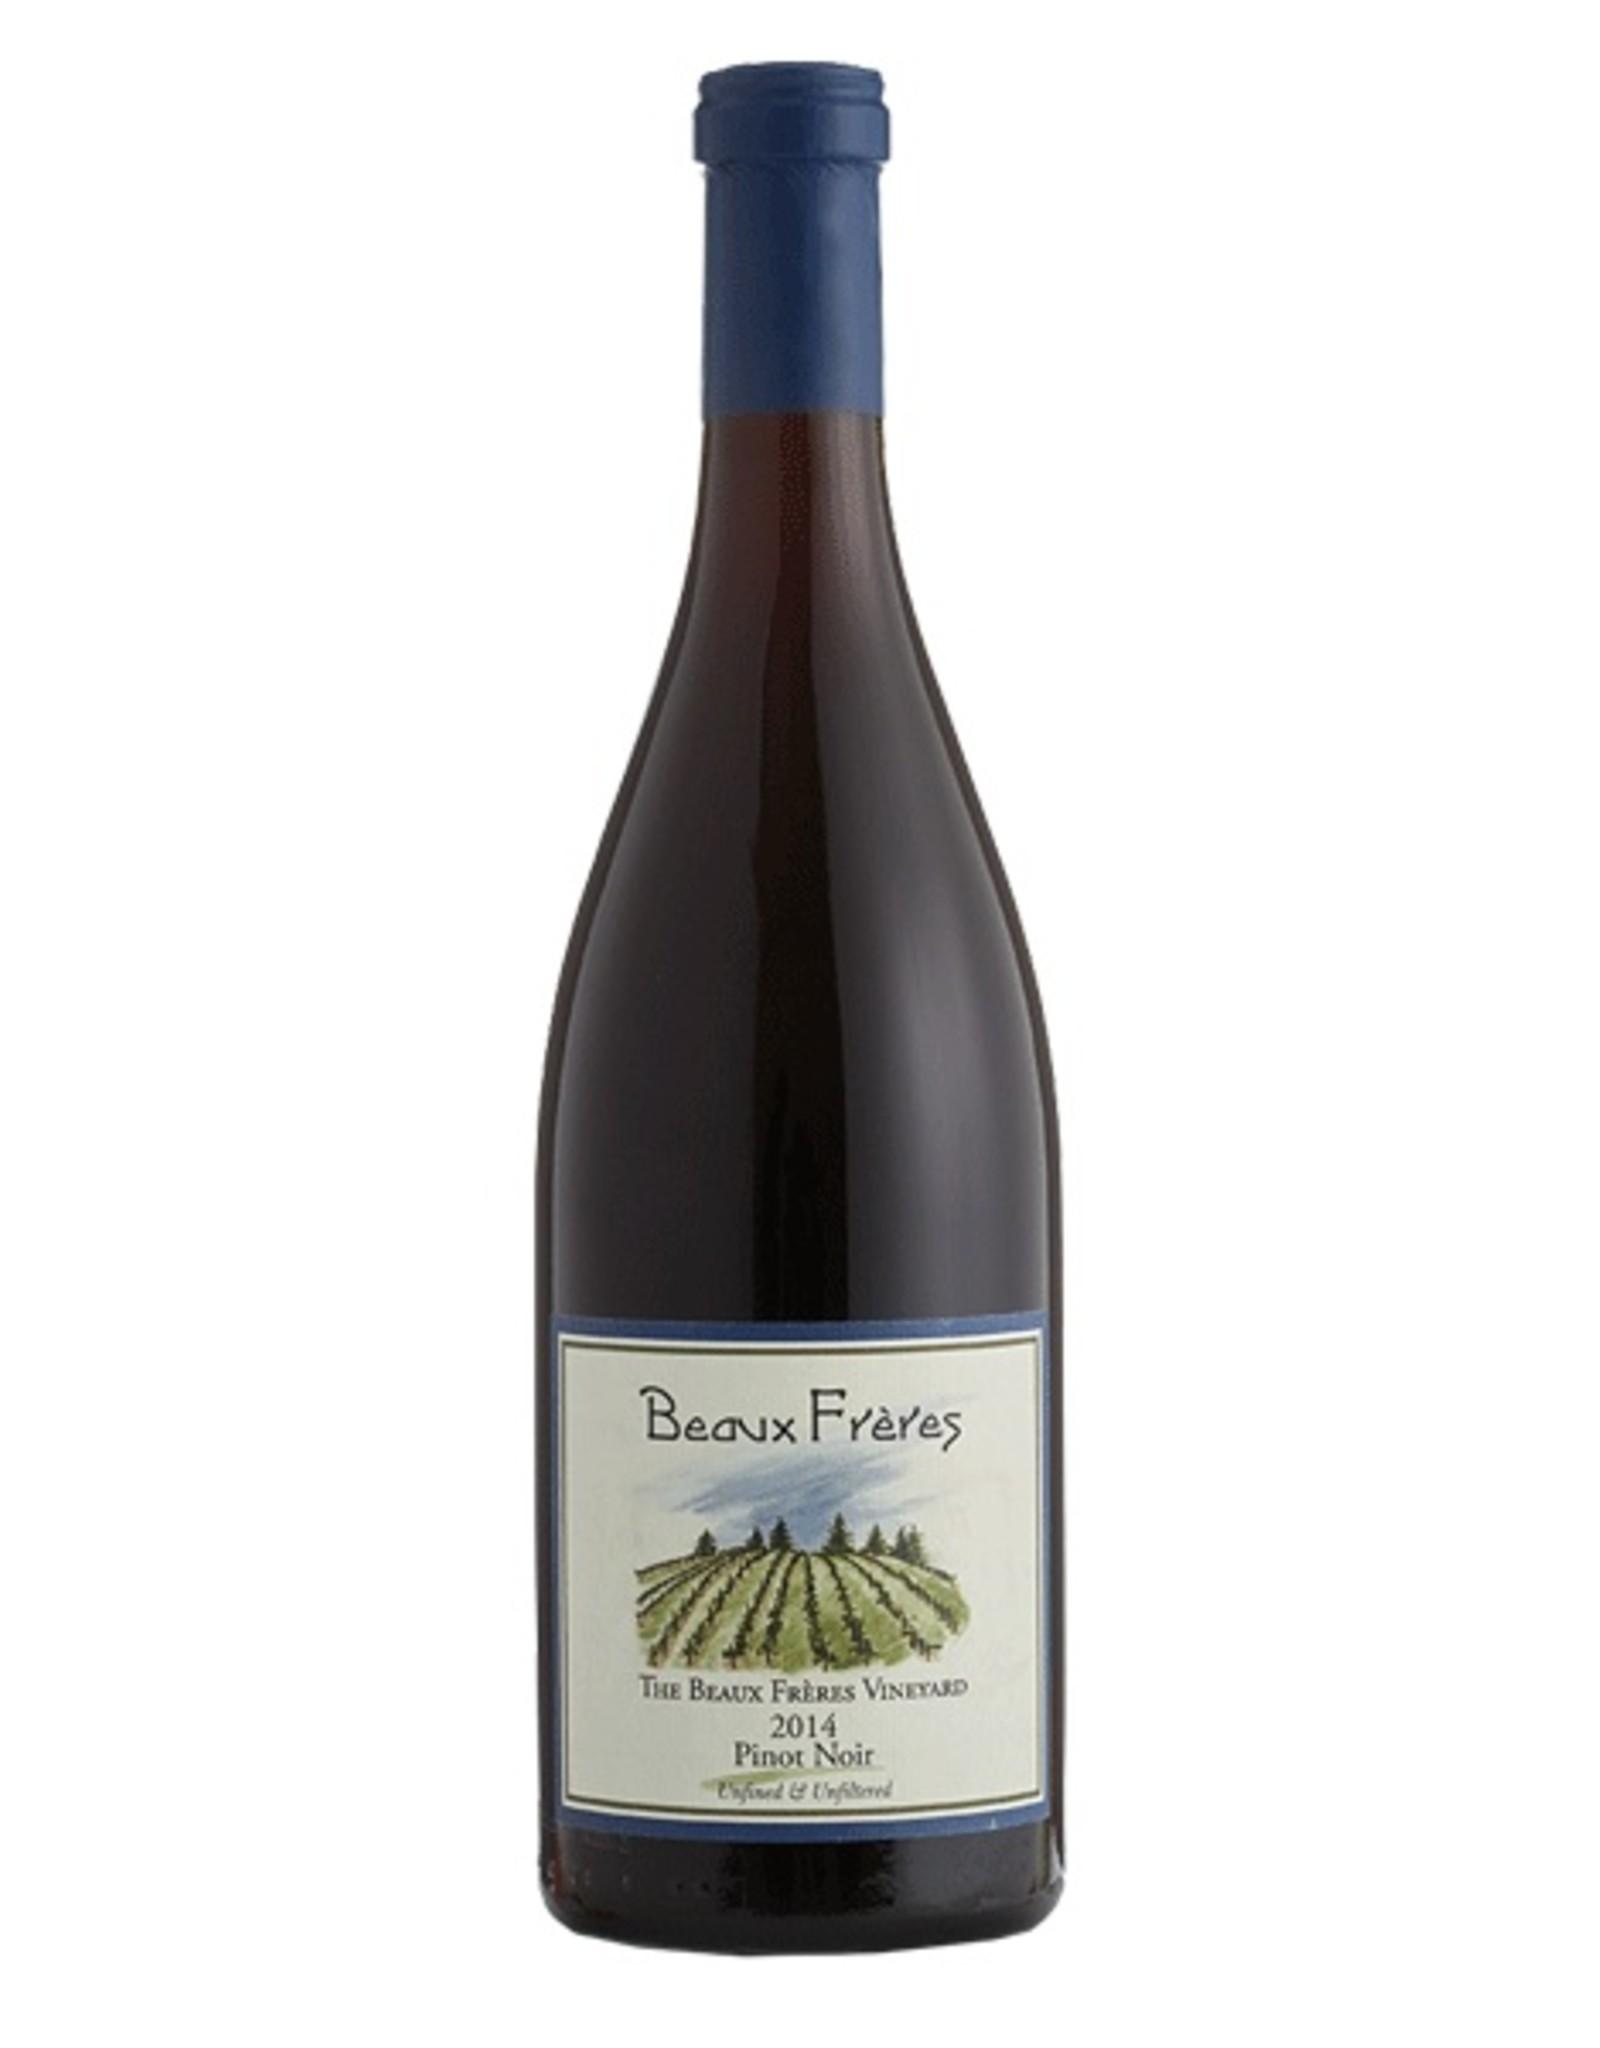 Red Wine 2014, Beaux Freres Vineyard, Pinot Noir, Ribbon Ridge, Willamette Valley, Oregon, 14% Alc, CT91, WS95 JS95, WS#3